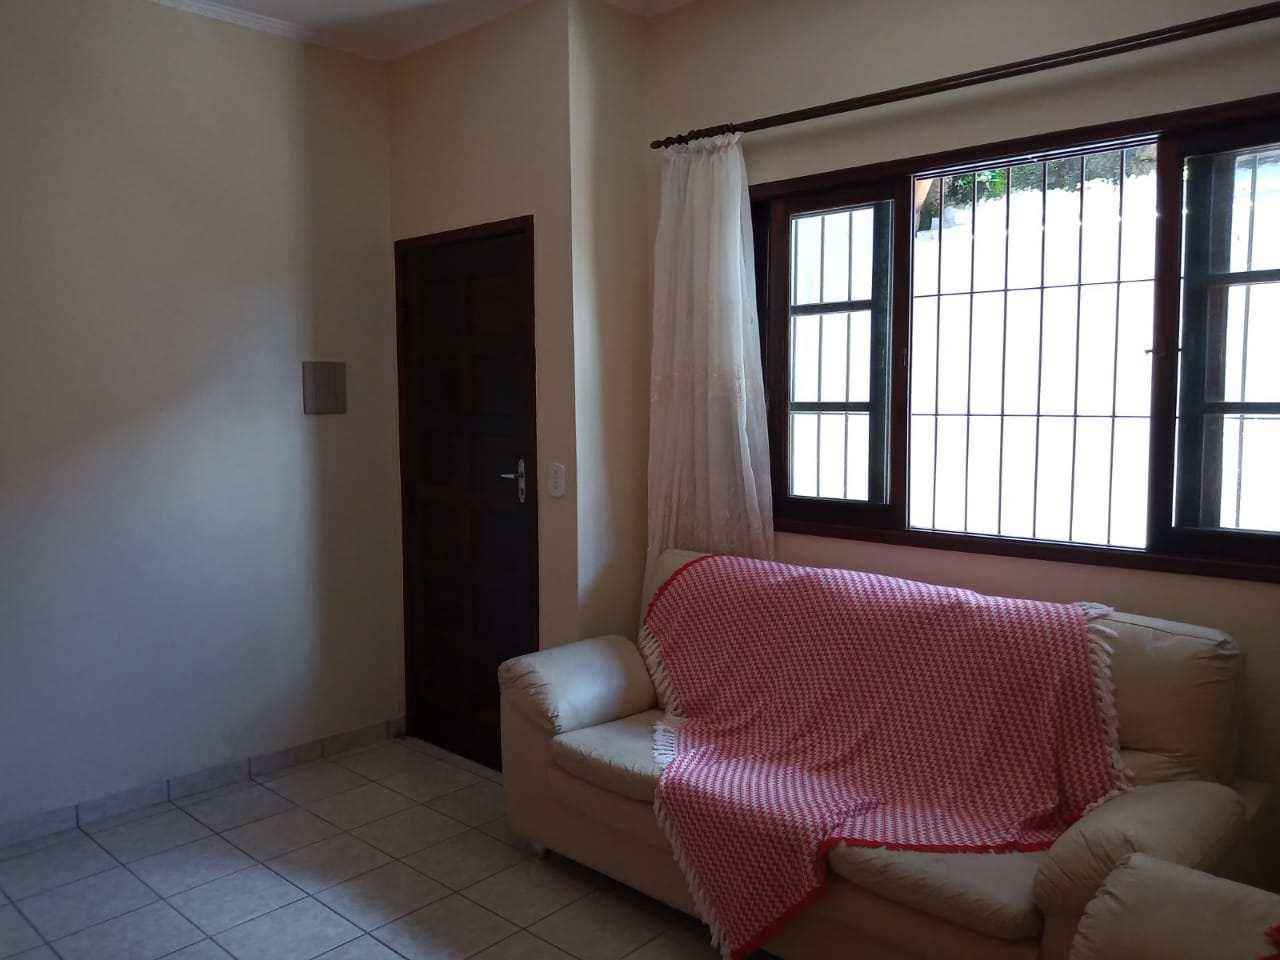 Casa com 2 dorms, Loty, Itanhaém - R$ 240 mil, Cod: 5436